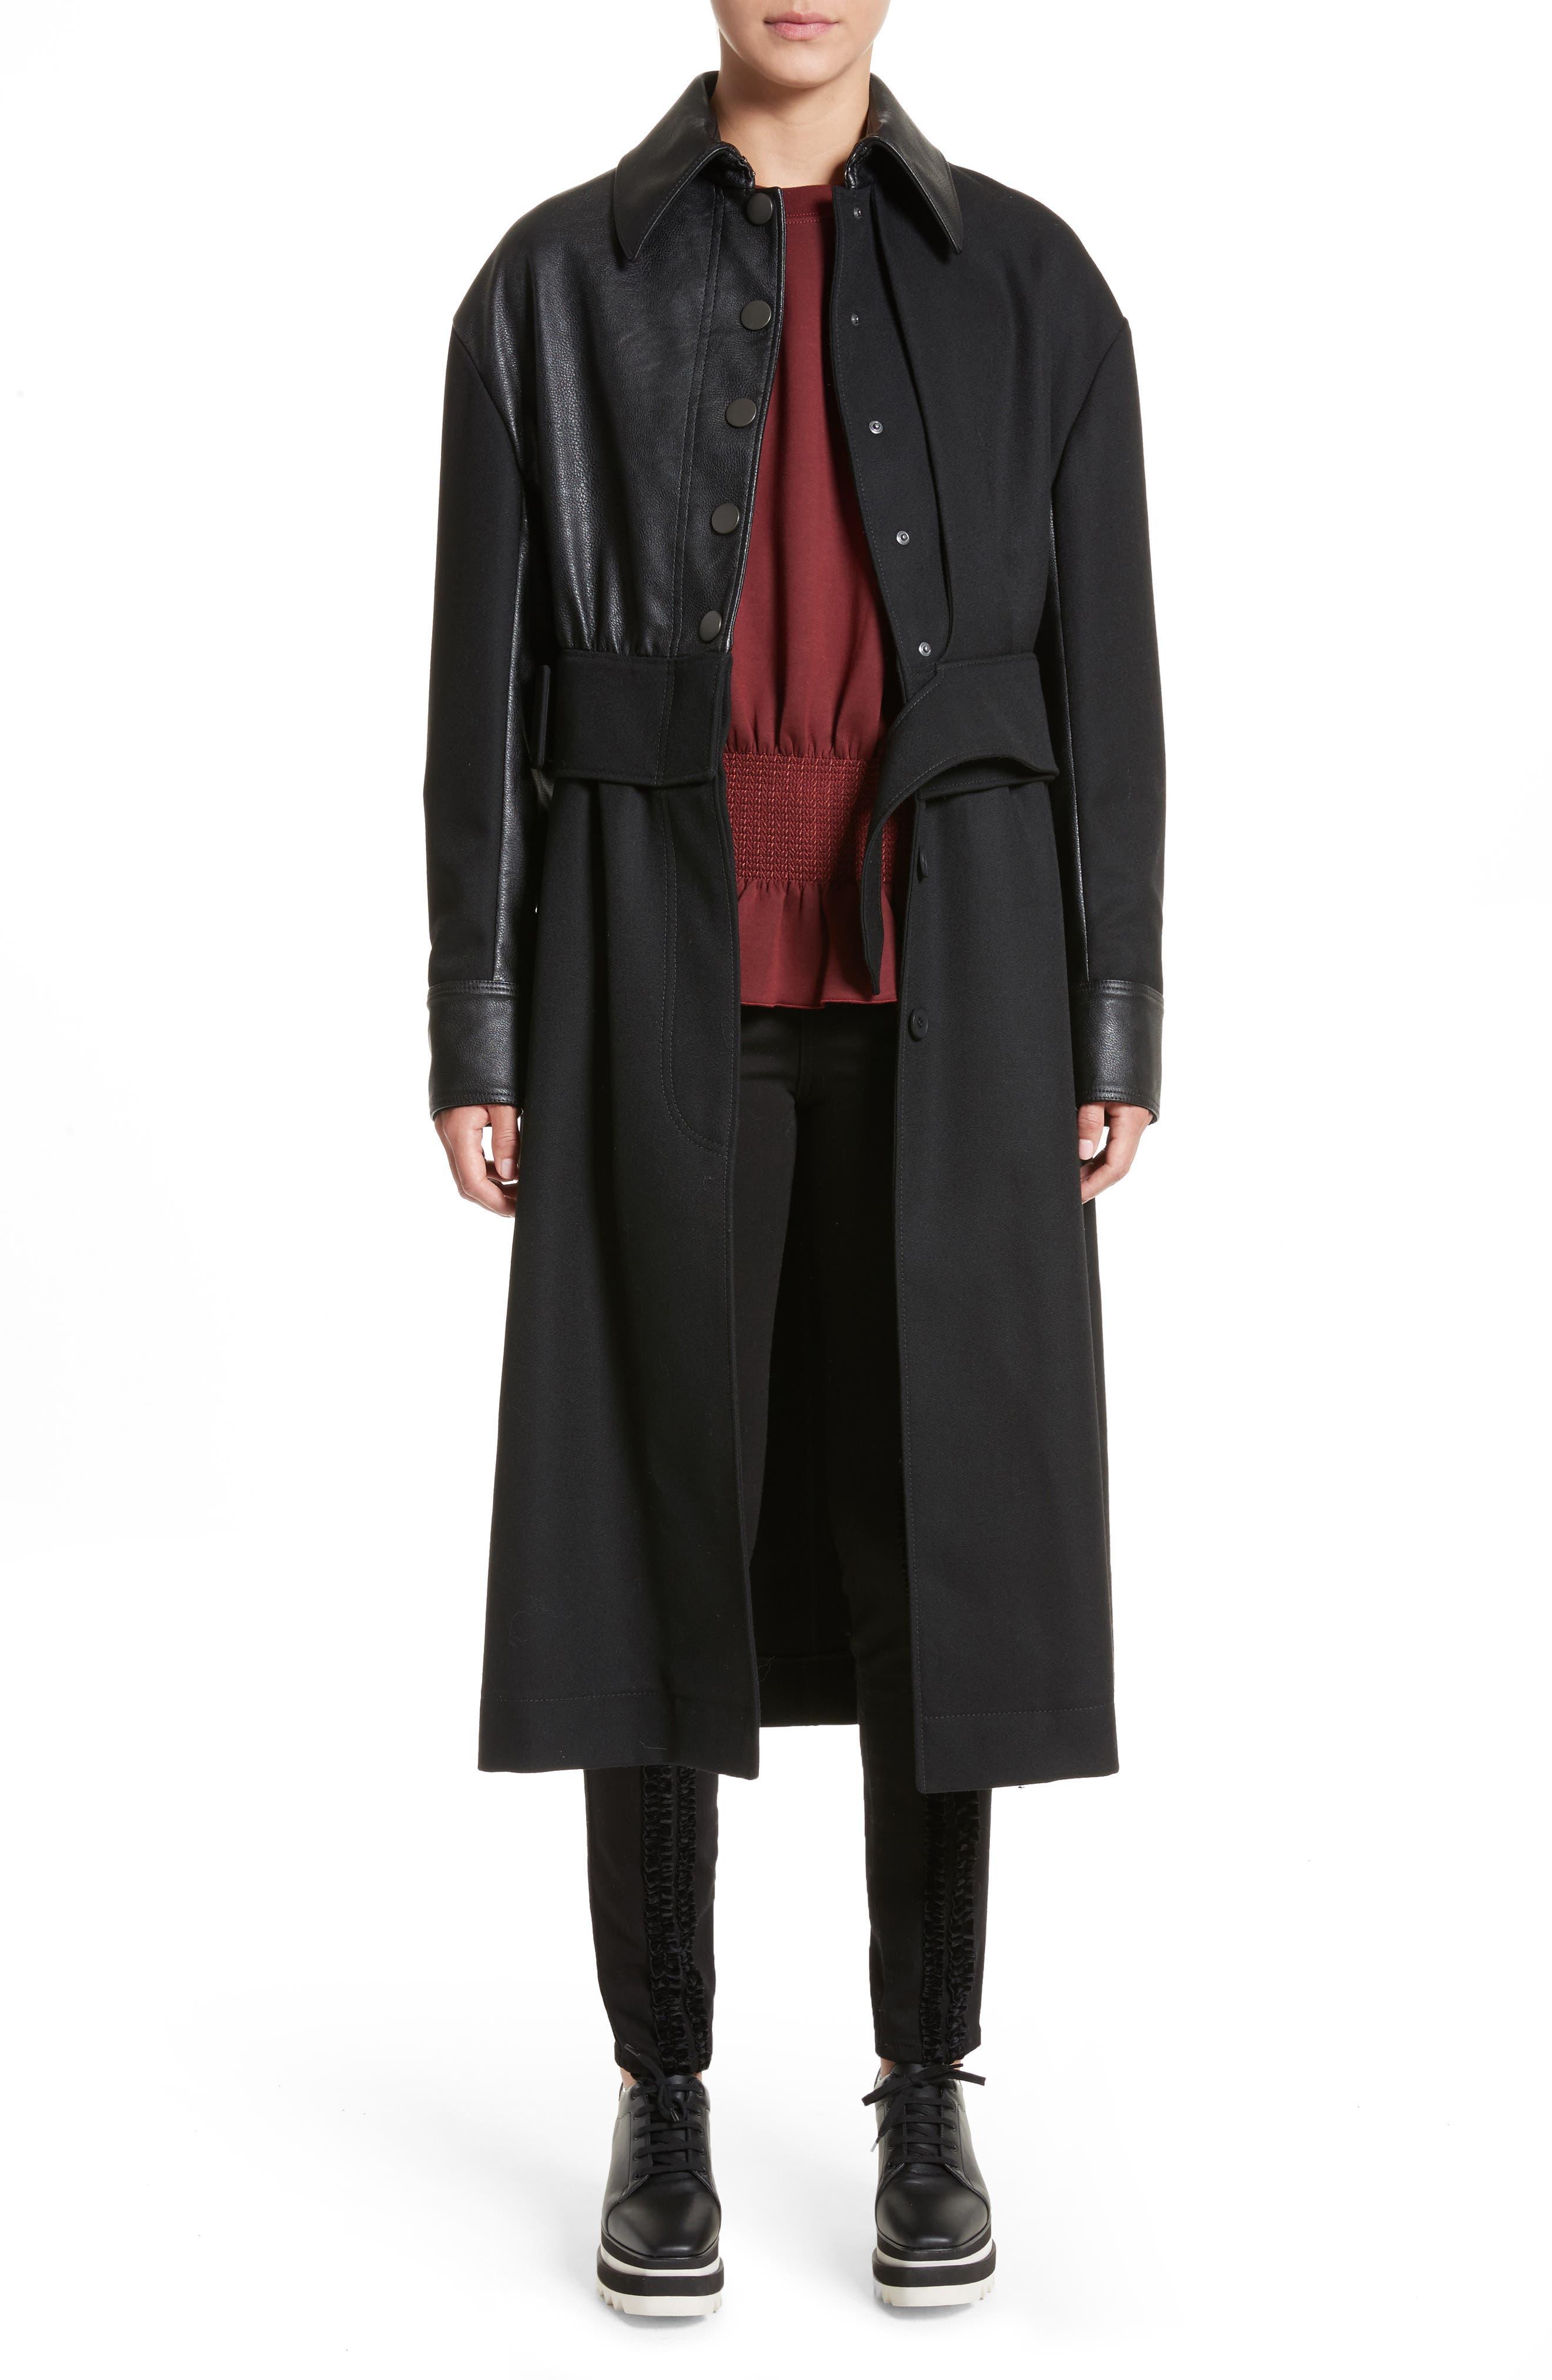 Eden Alter Leather Trim Wool Coat,                         Main,                         color, 001